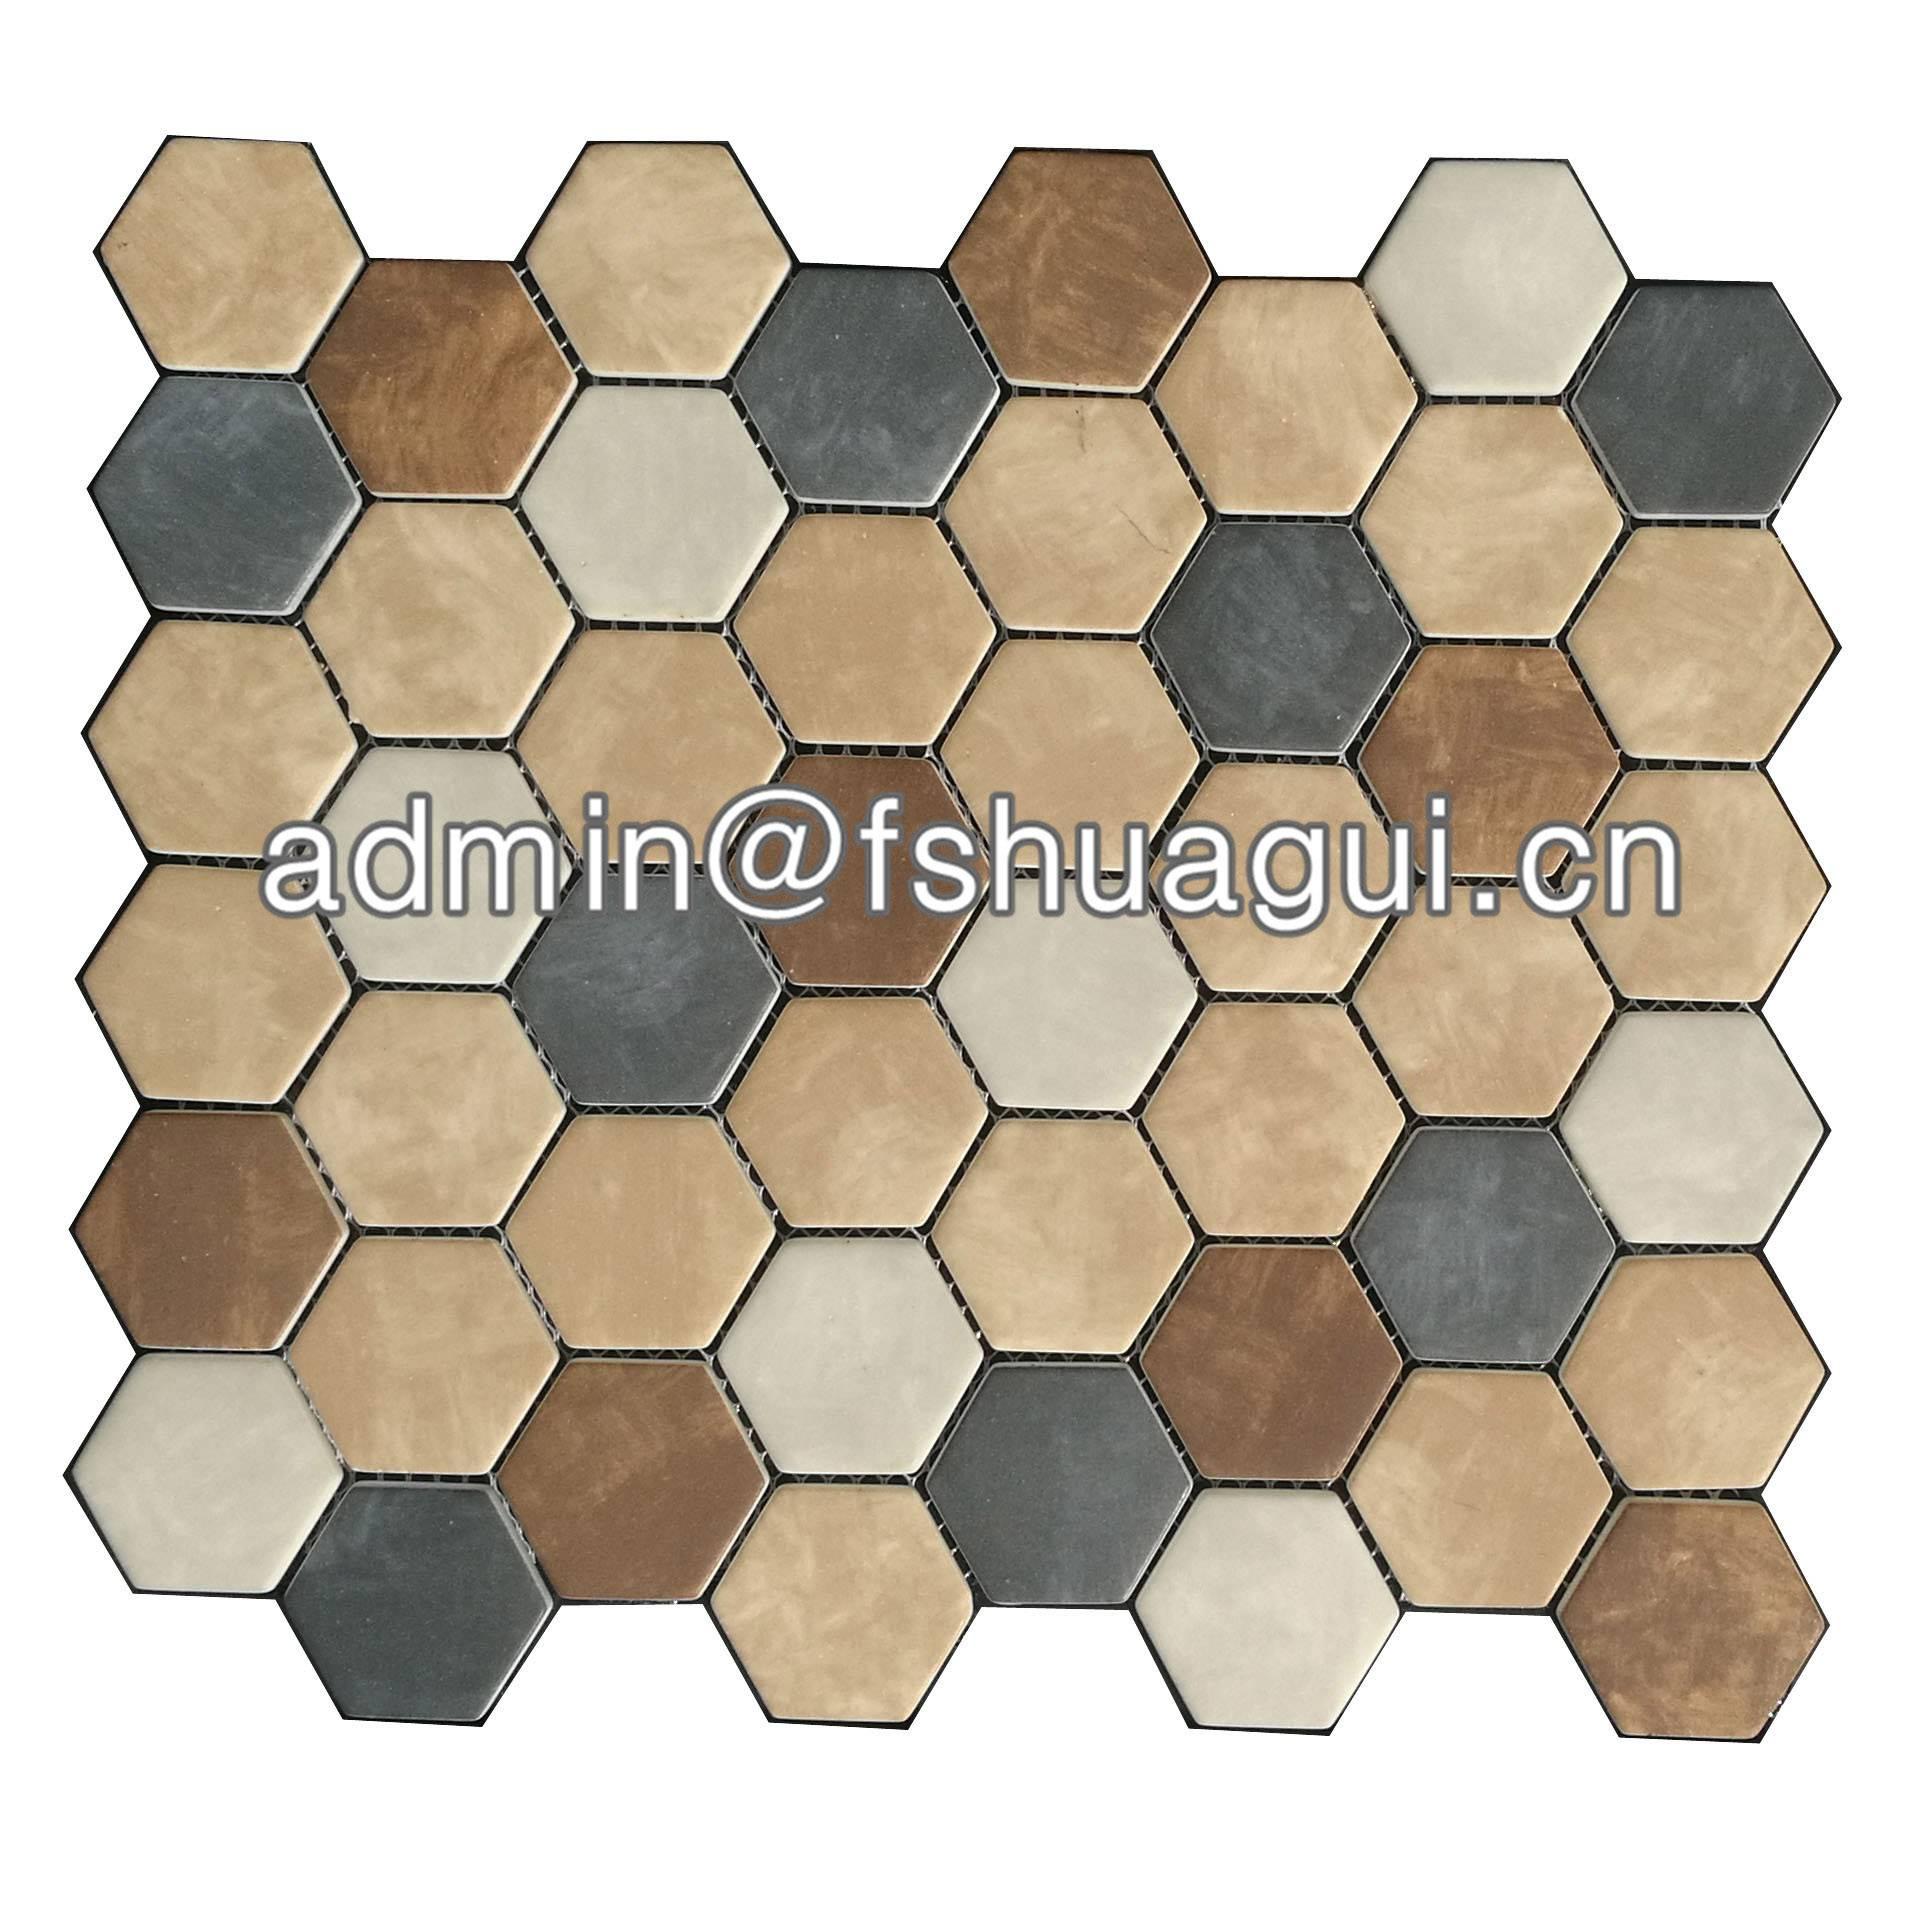 Huagui Brown mix hexagon mosaic tiles south africa HG-WJ407 CERAMIC MOSAIC TILE image1